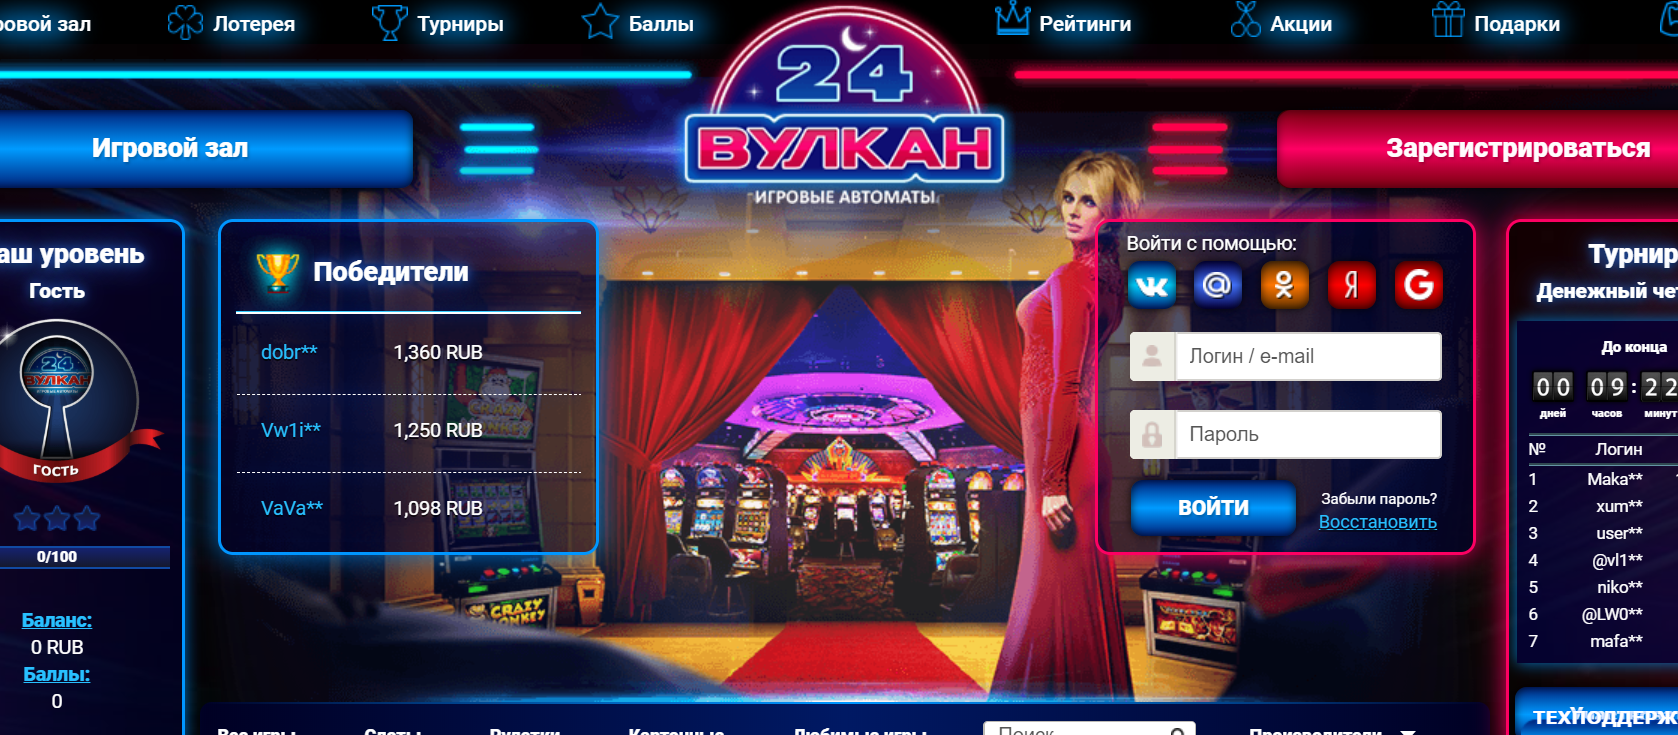 Побеждайте вместе с площадкой казино Вулкан 24